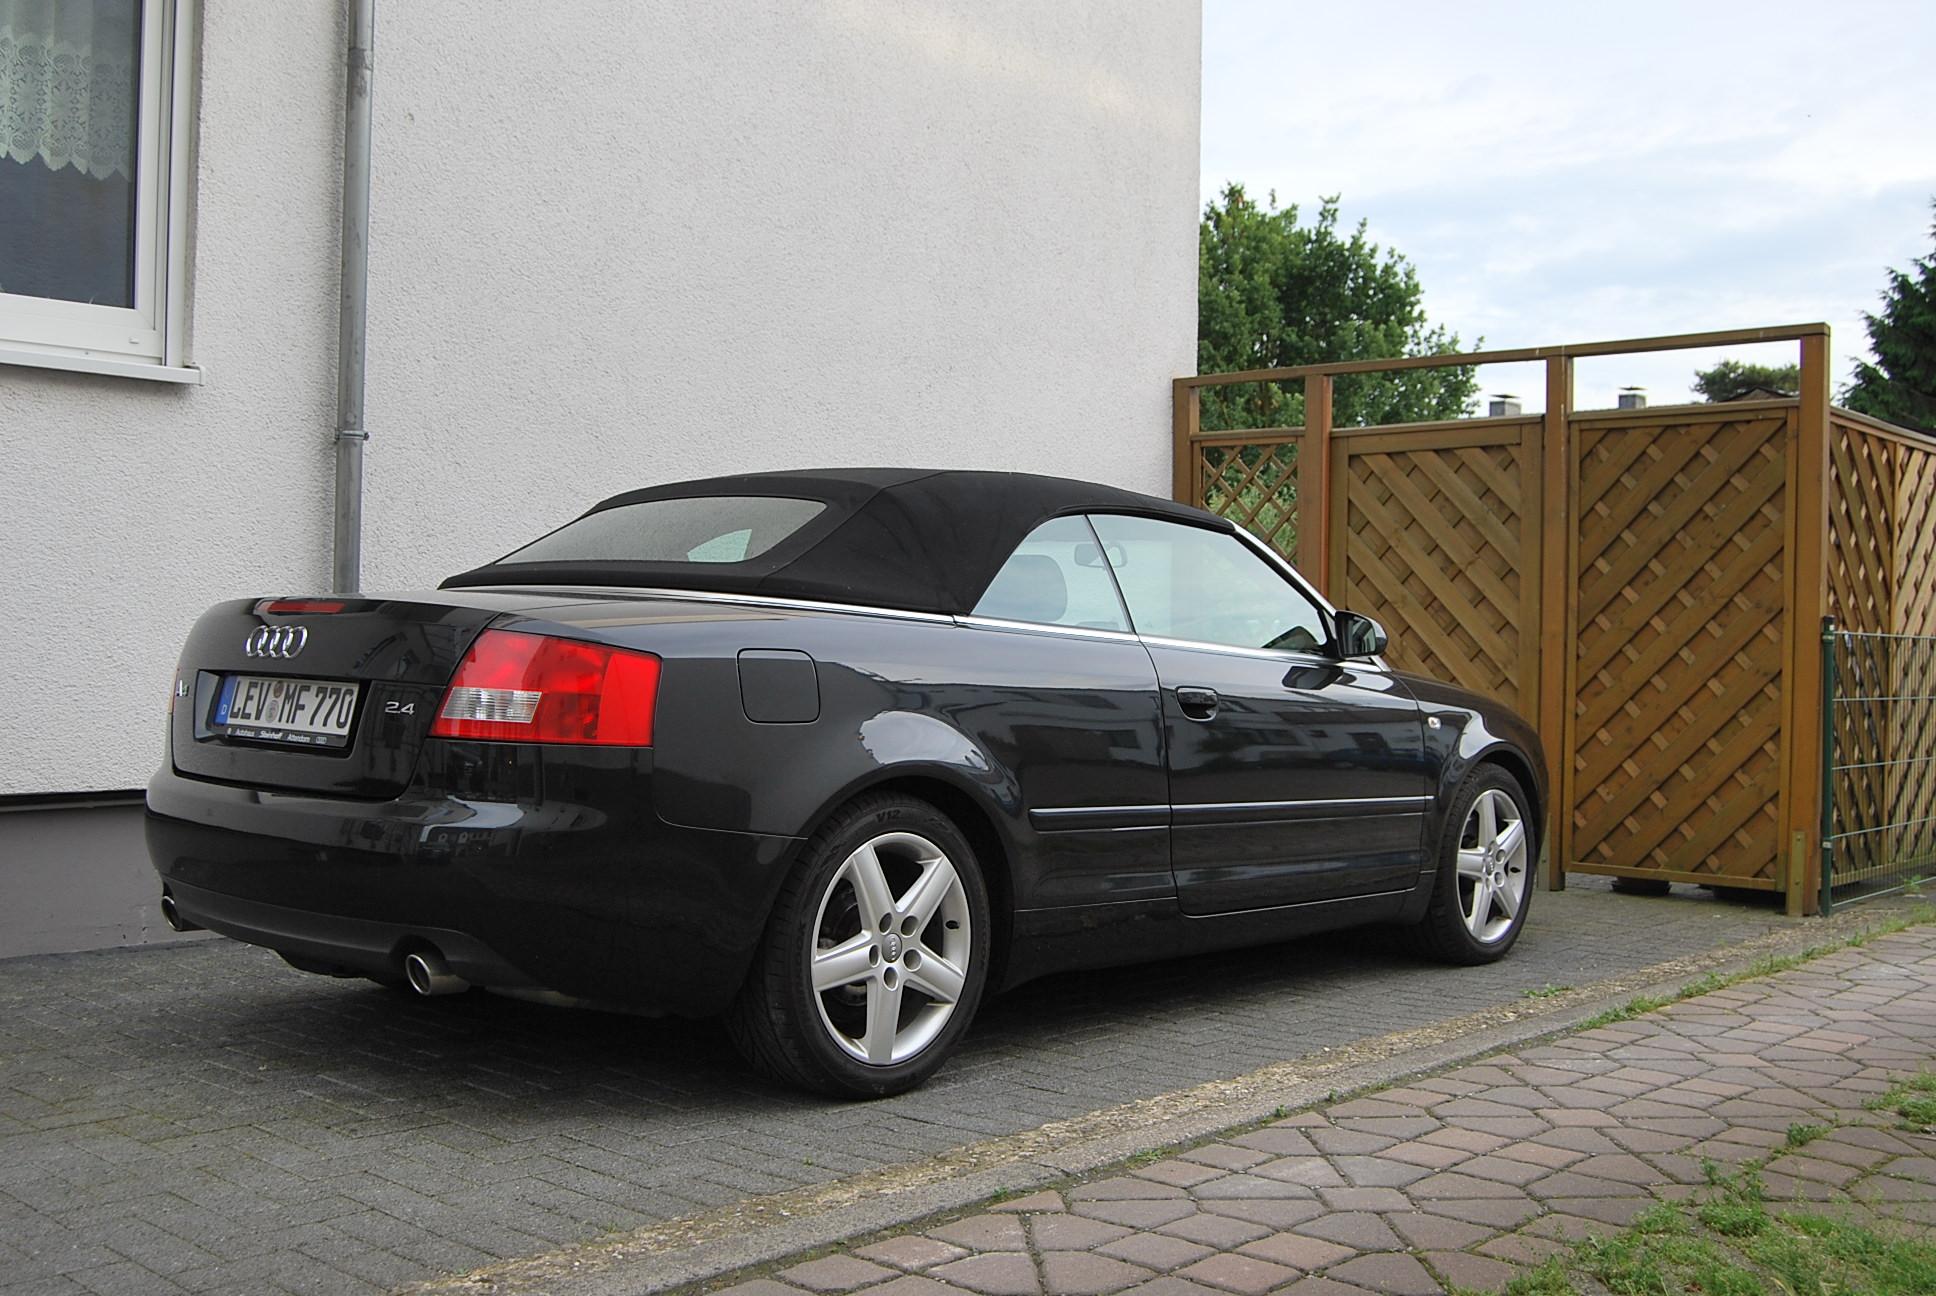 Audi a4 2.4 cabriolet